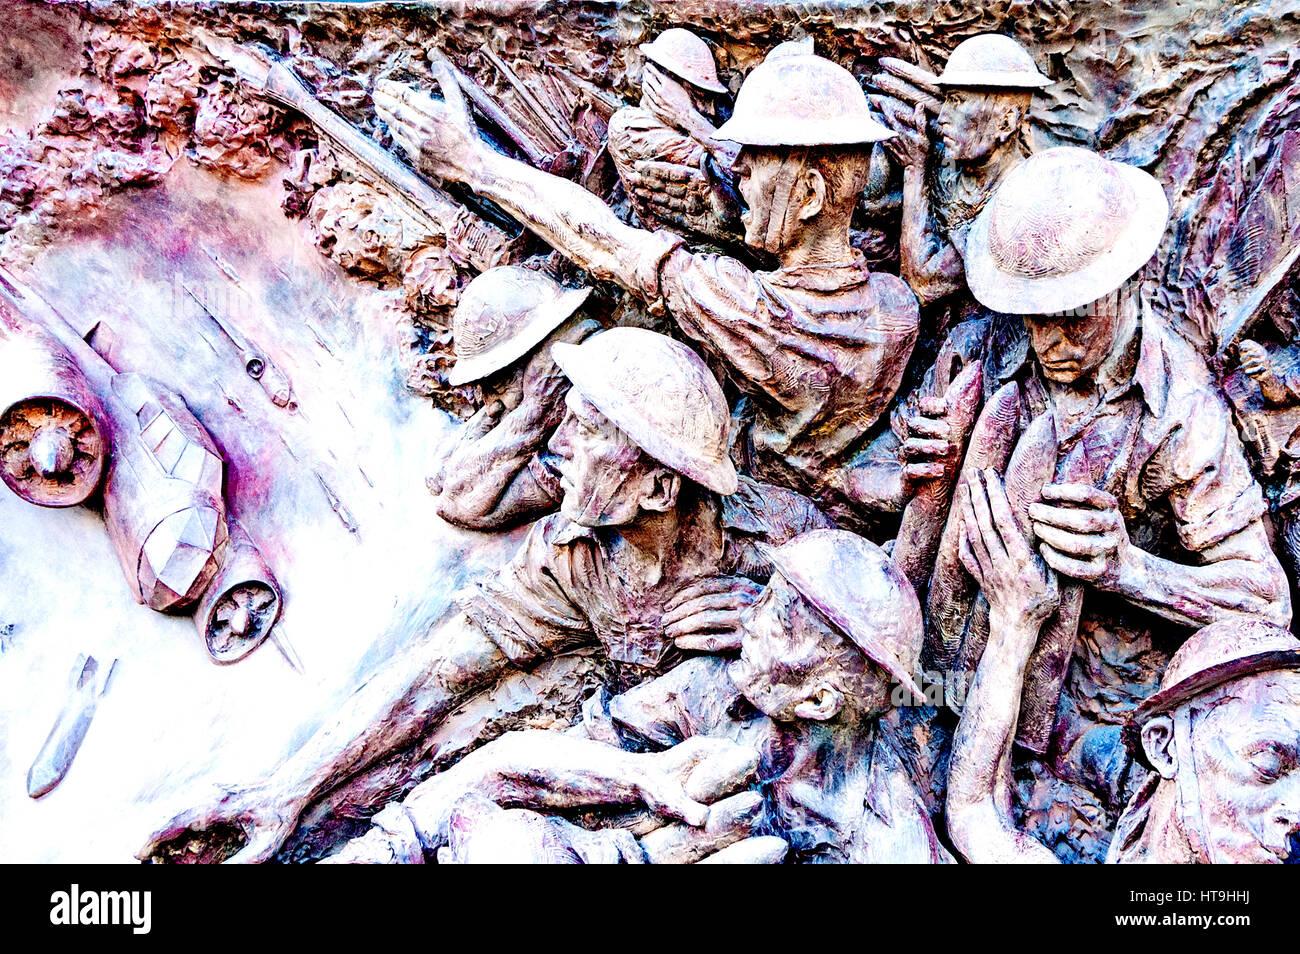 Tapferkeit Stock Photos & Tapferkeit Stock Images - Alamy